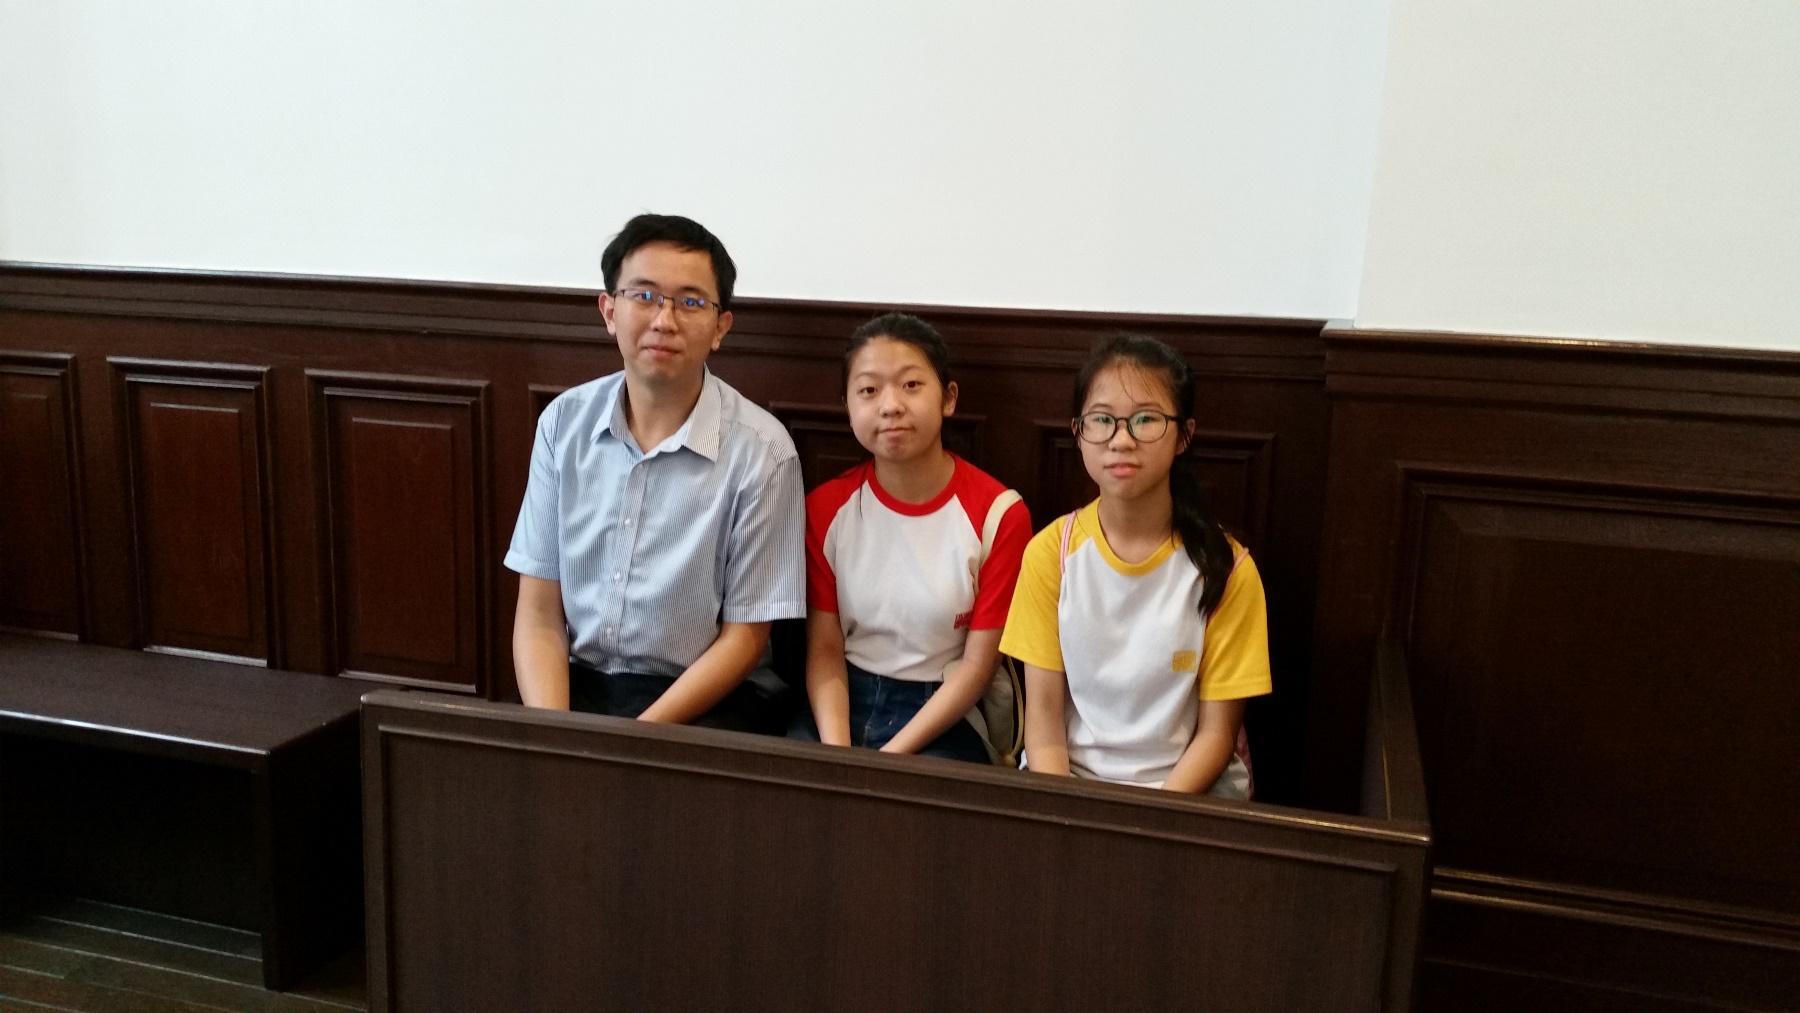 https://npc.edu.hk/sites/default/files/20190711_110219.jpg